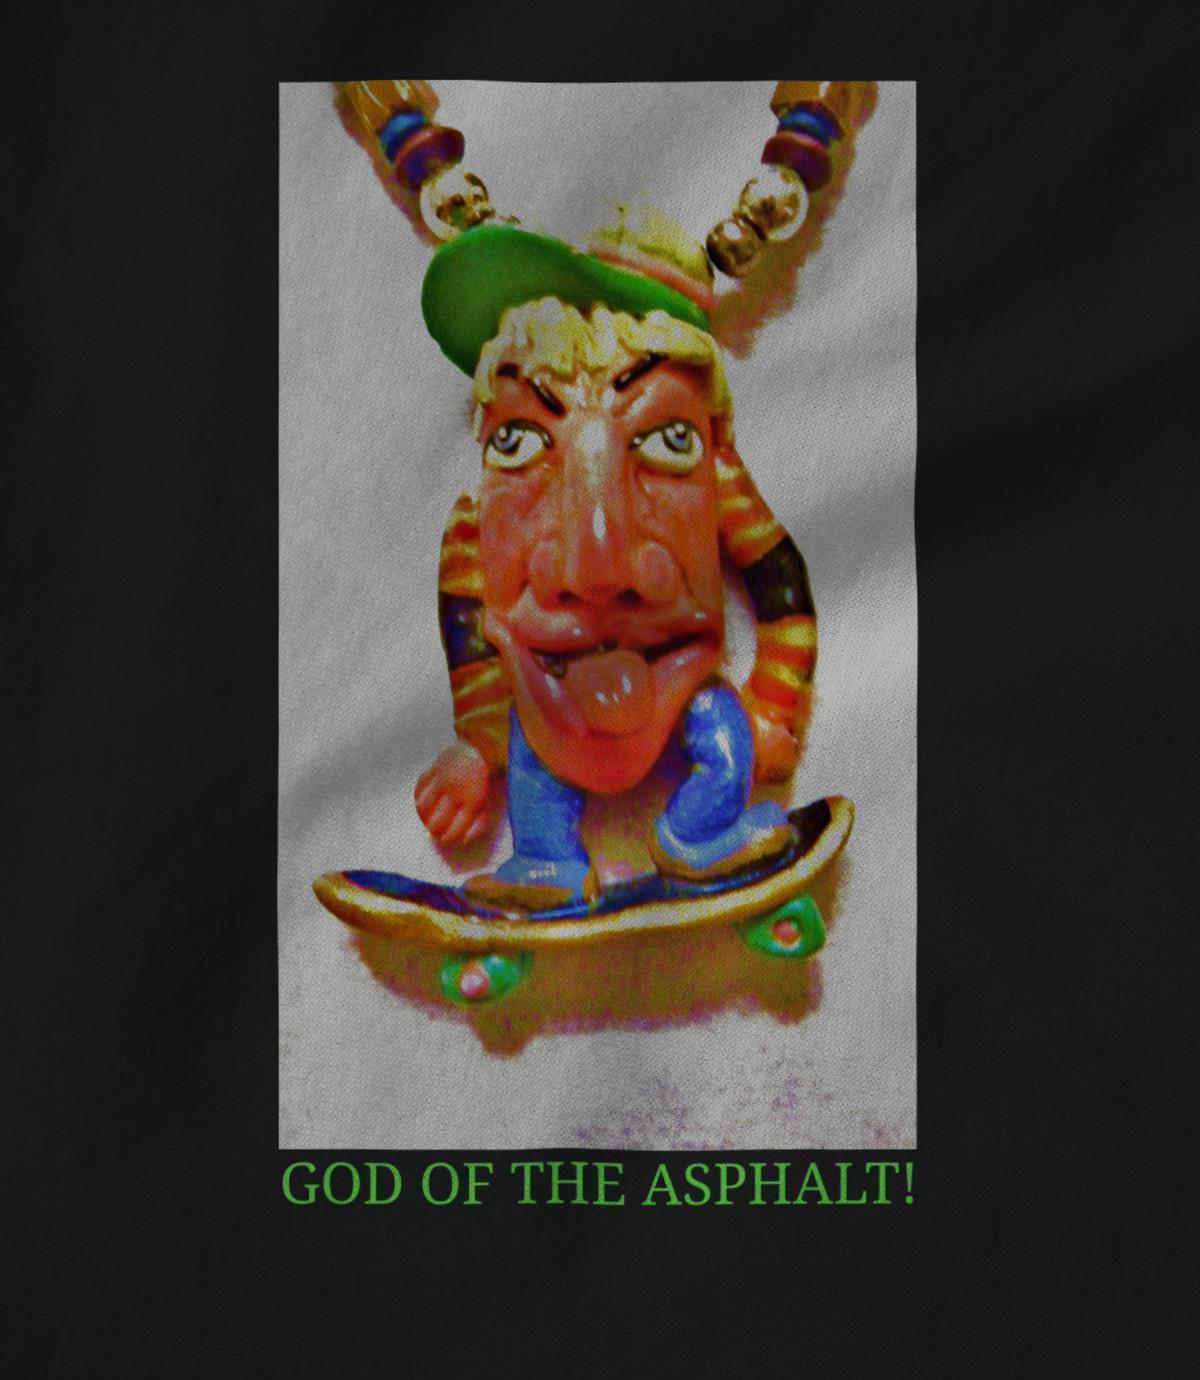 Matthew f  blowers iii god of the asphalt 1 1505939820